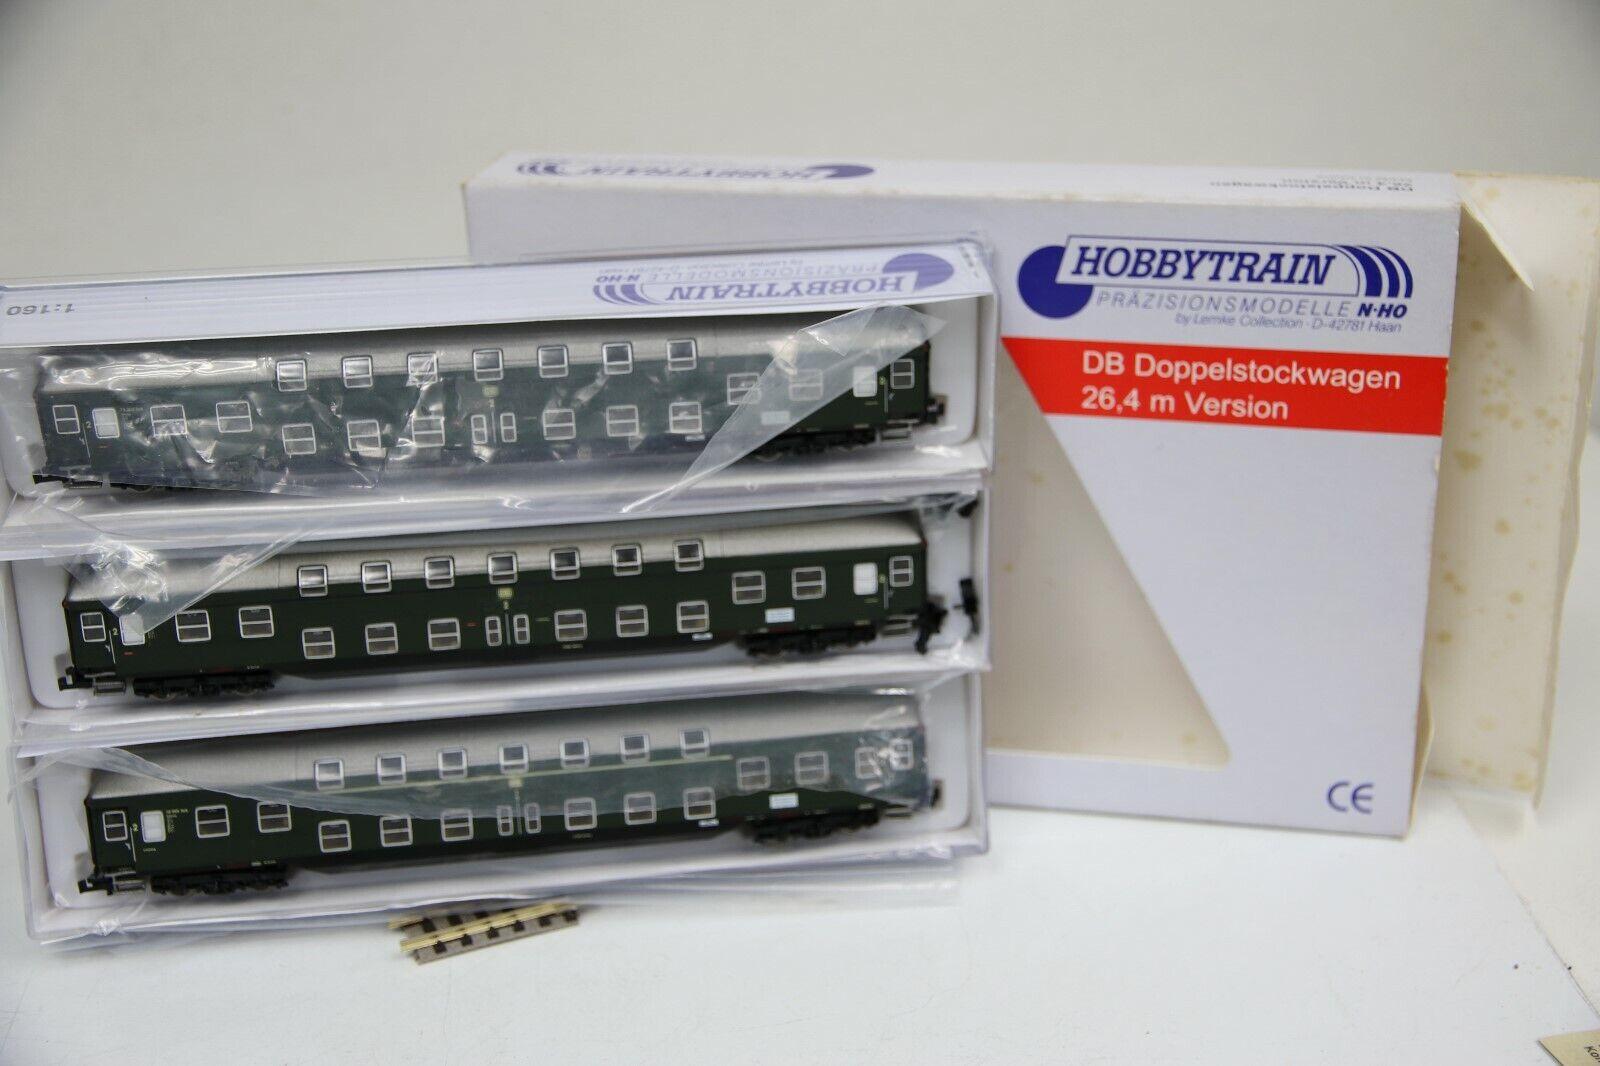 Hobbytrain N h22030 Set 3 pezzi dB bastone doppio carrello verde delle DB in OVP (rc8)